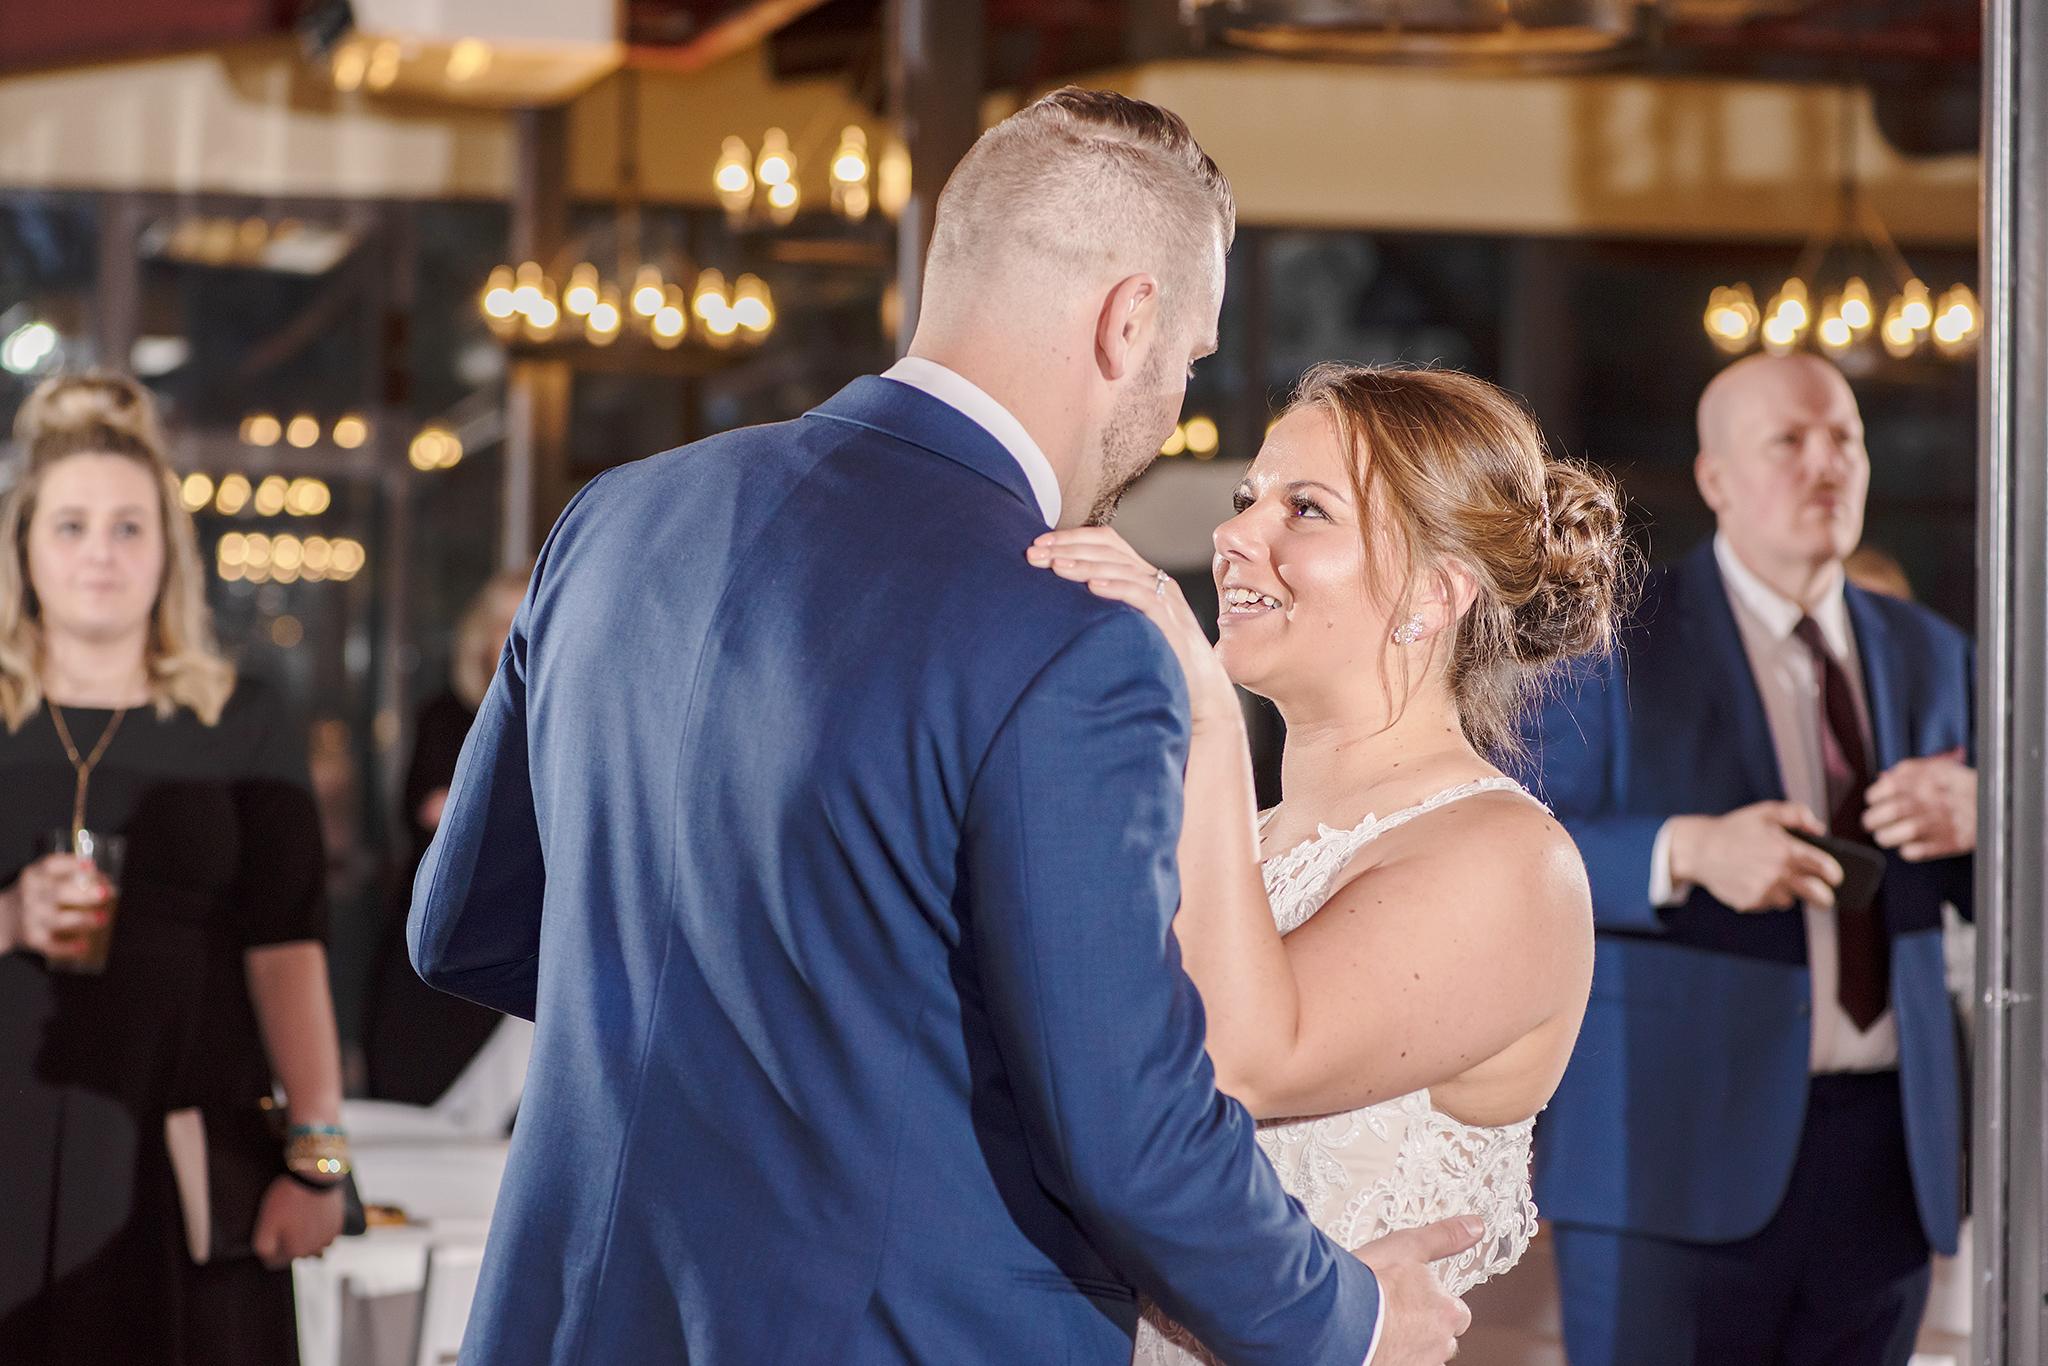 LINDSAY-ADKINS-PHOTOGRAPHY-MICHIGAN-WEDDING-PHOTOGRAPHER-FRANKENMUTH-BREWERY-WEDDING-MICHIGAN-BLOG-32